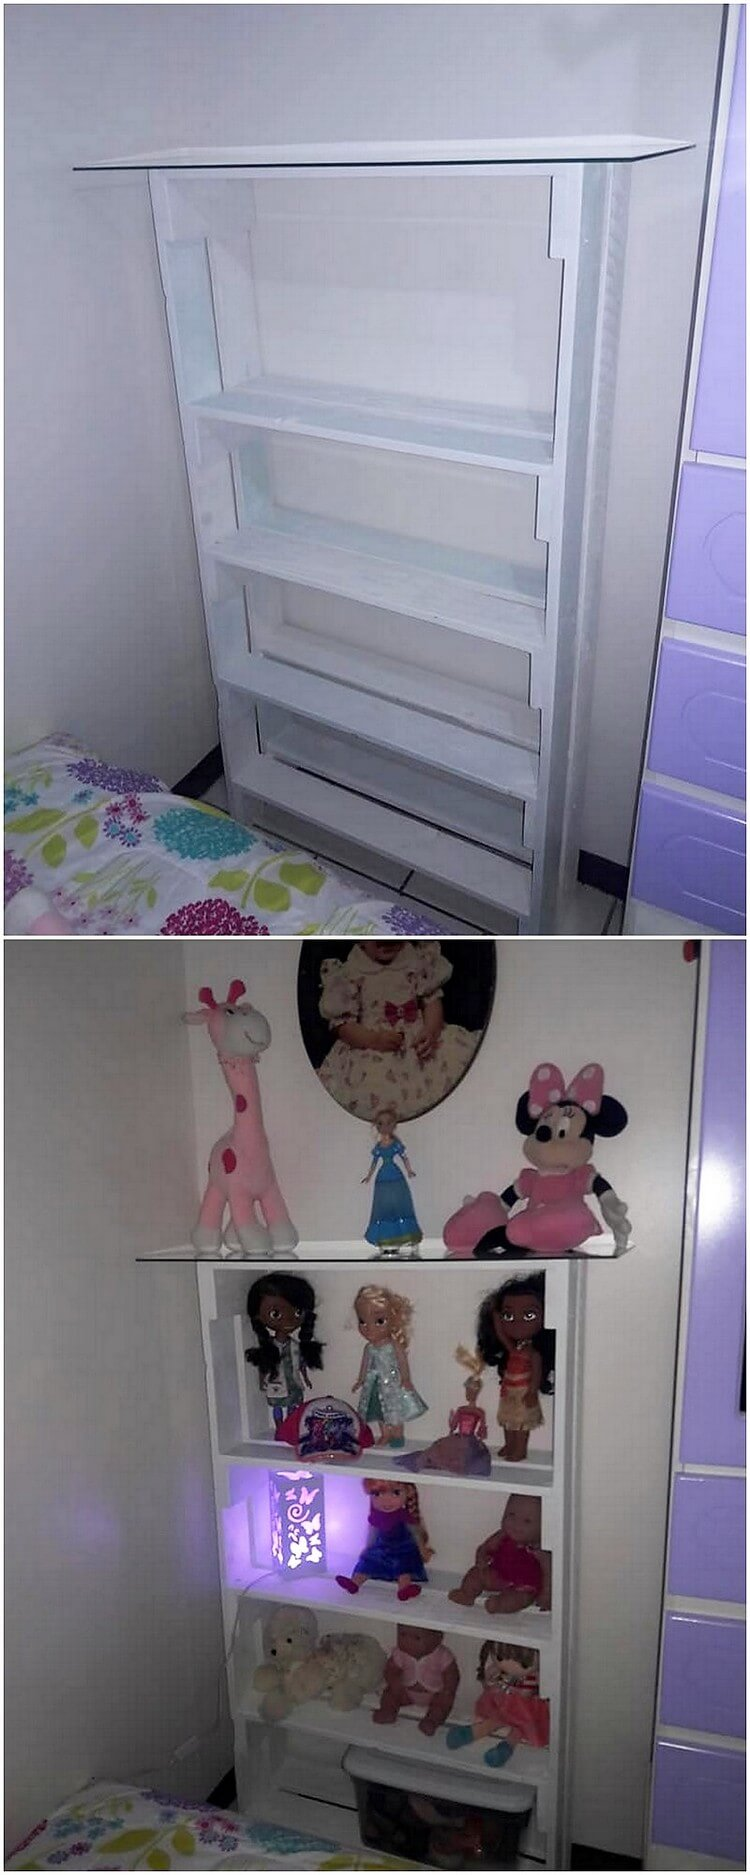 Pallet Shelving Unit for Kids Toys